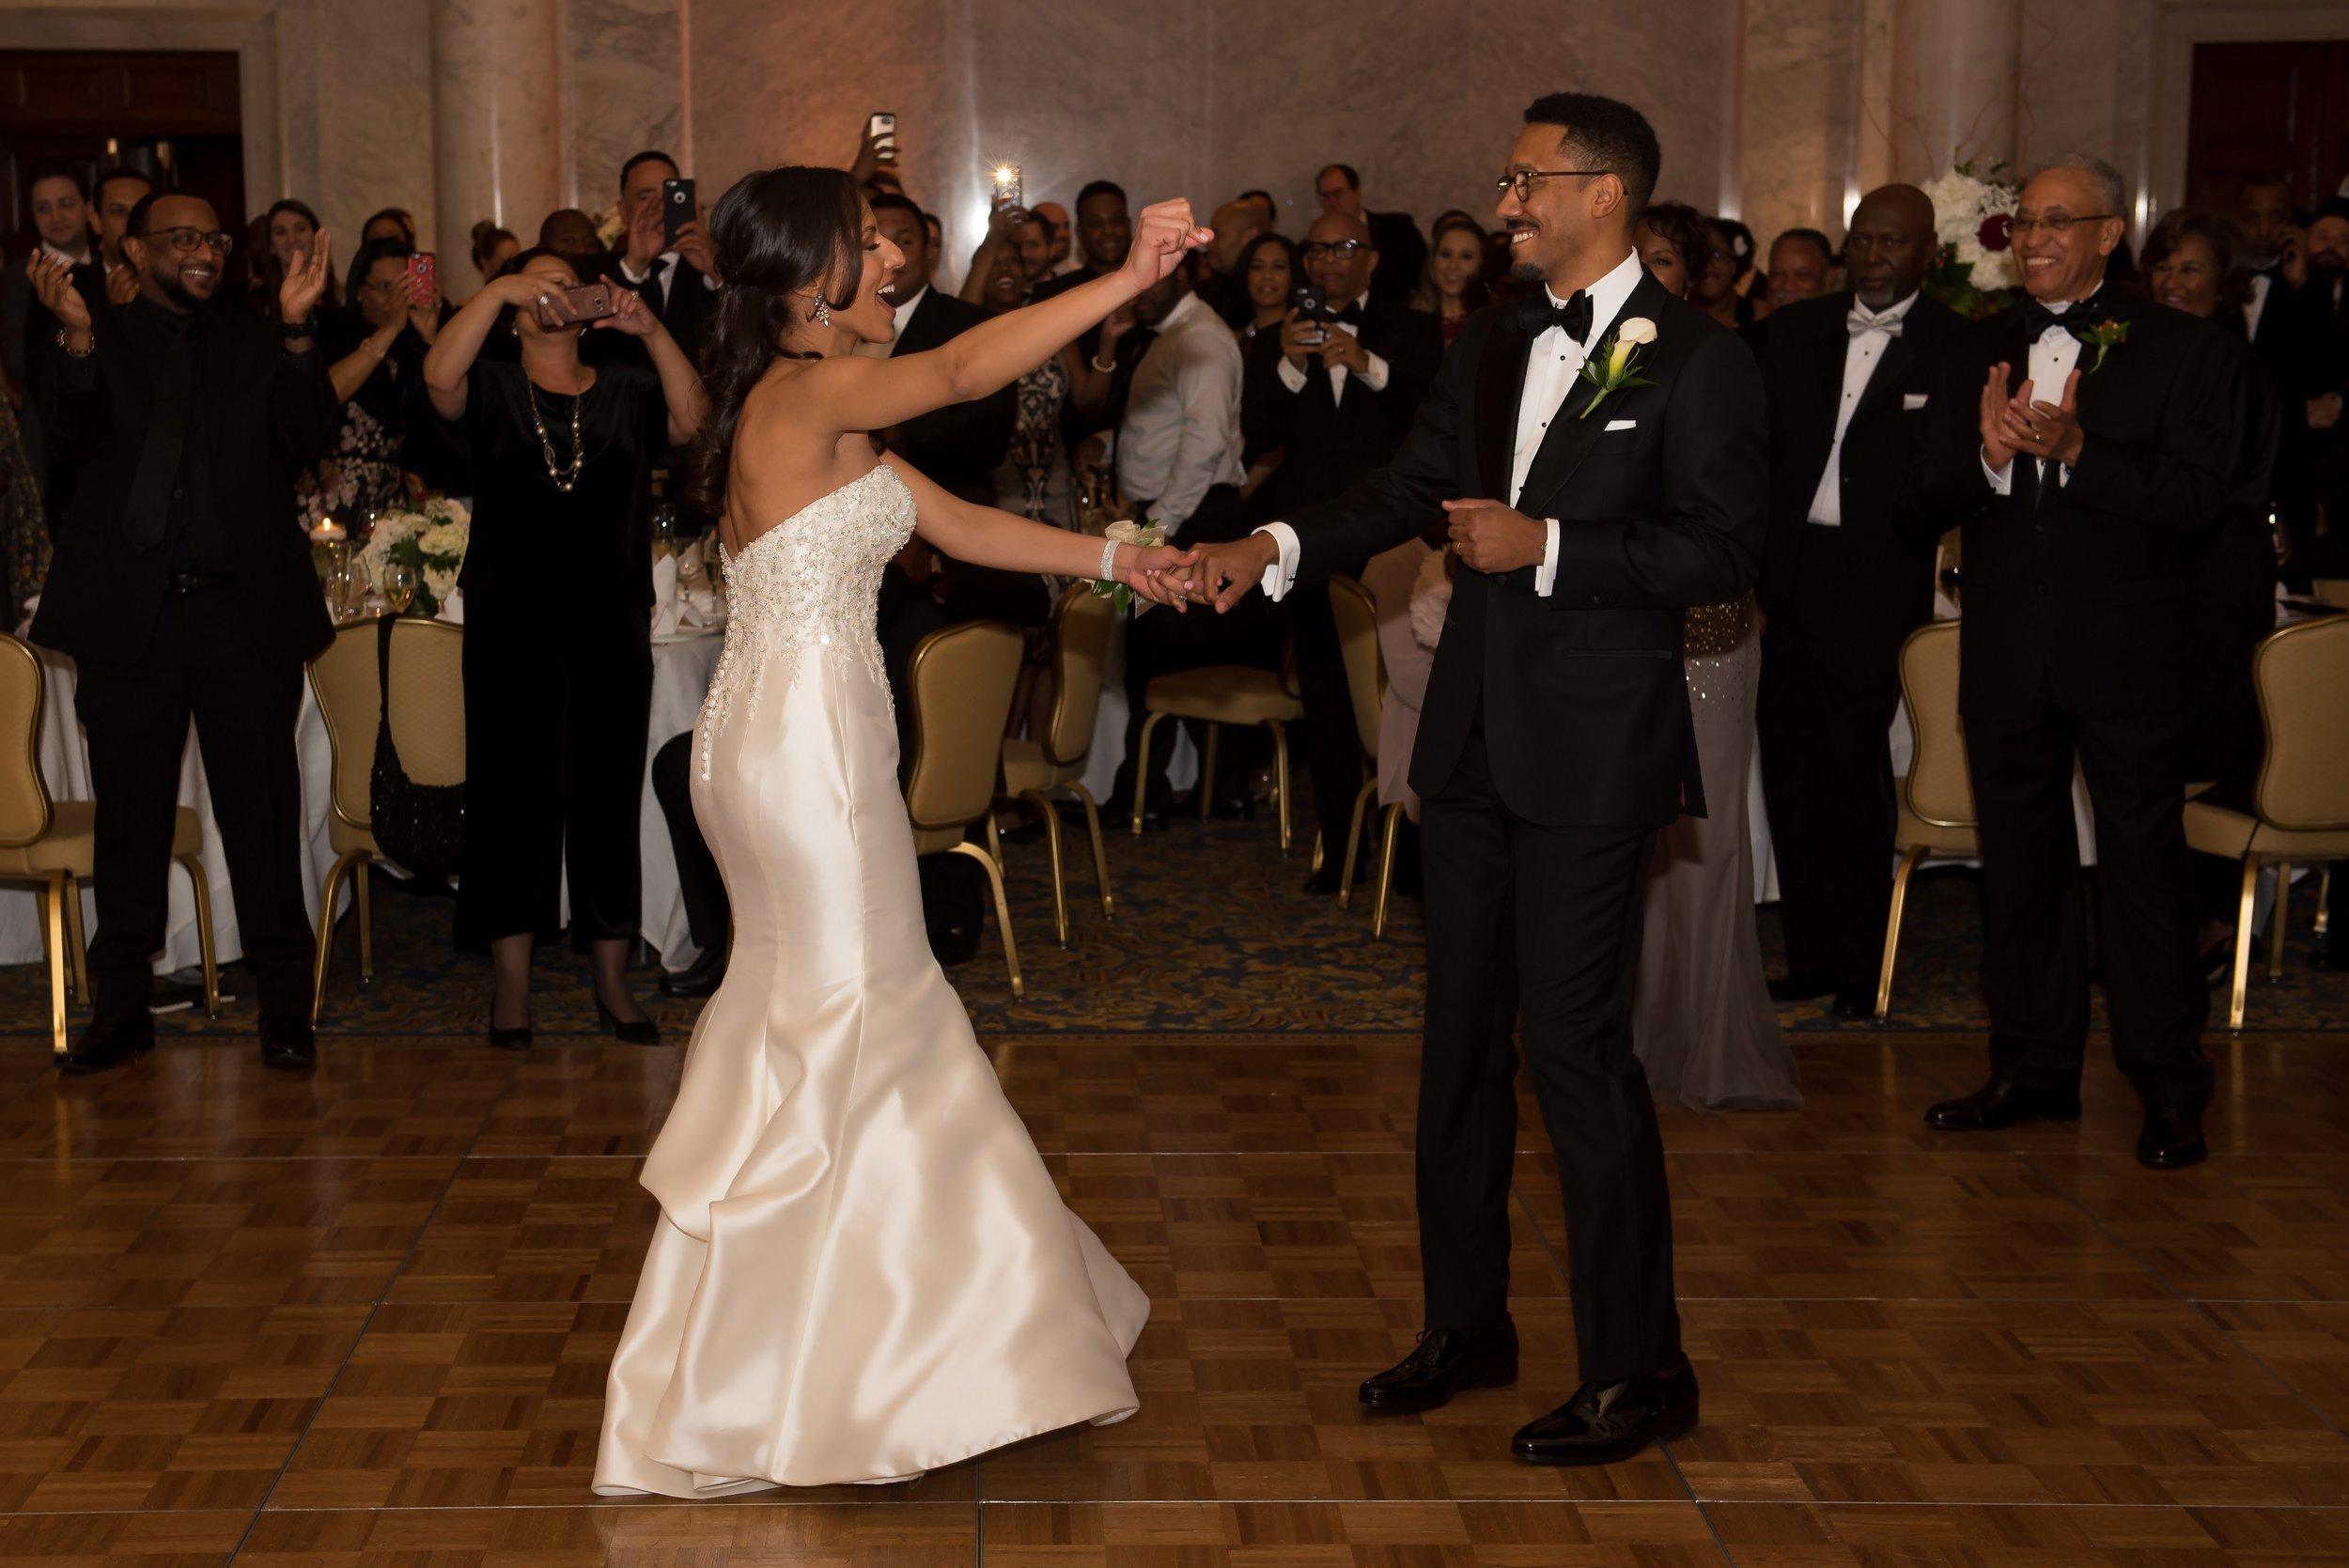 Marshall Wedding - 12.01.17-86.jpg